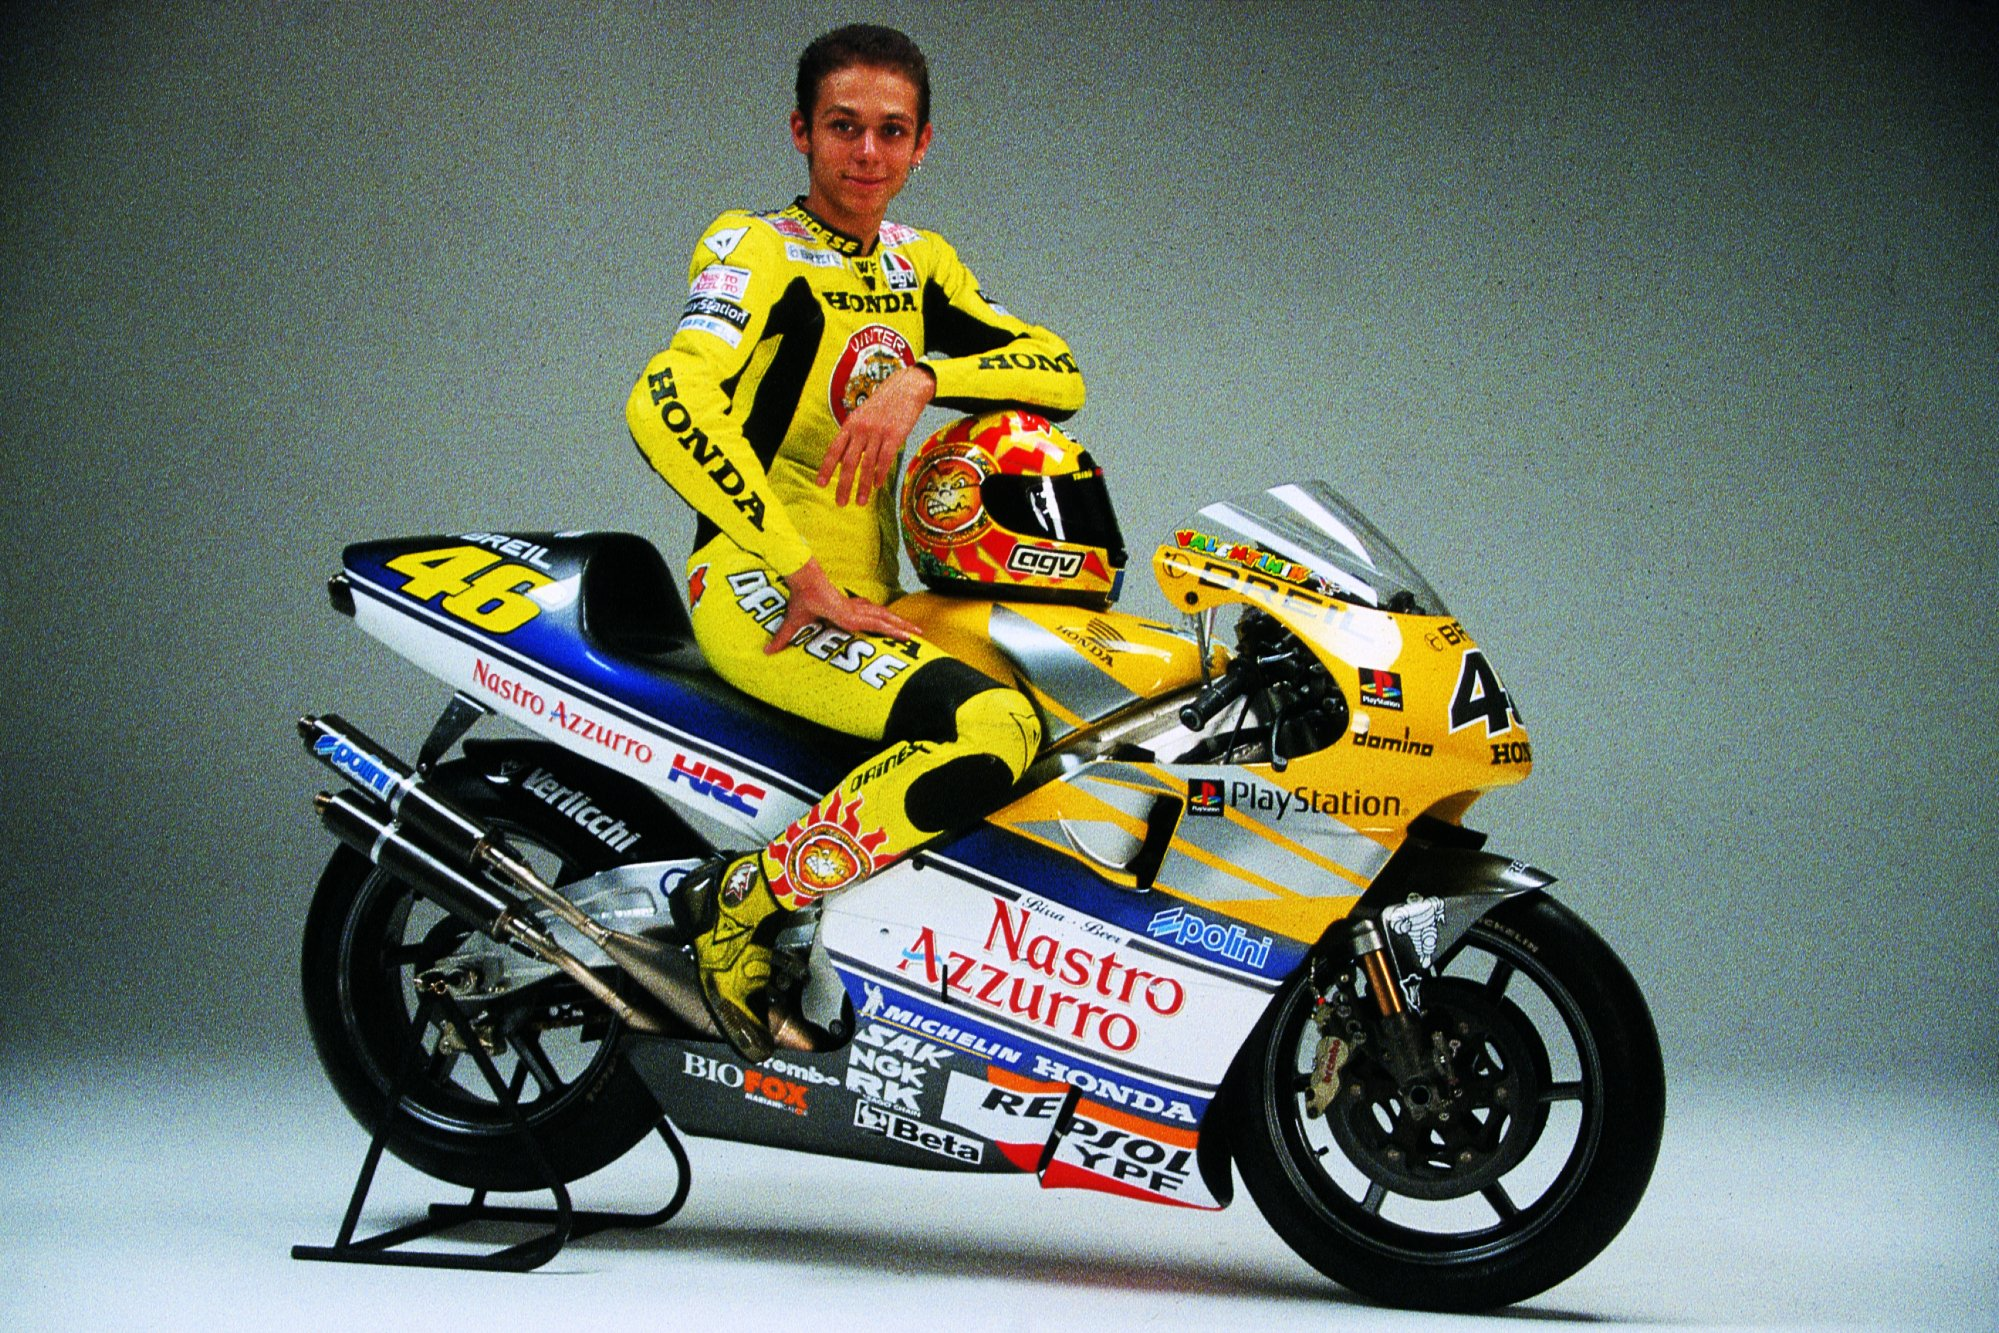 Valentino Rossi at Honda in 2001